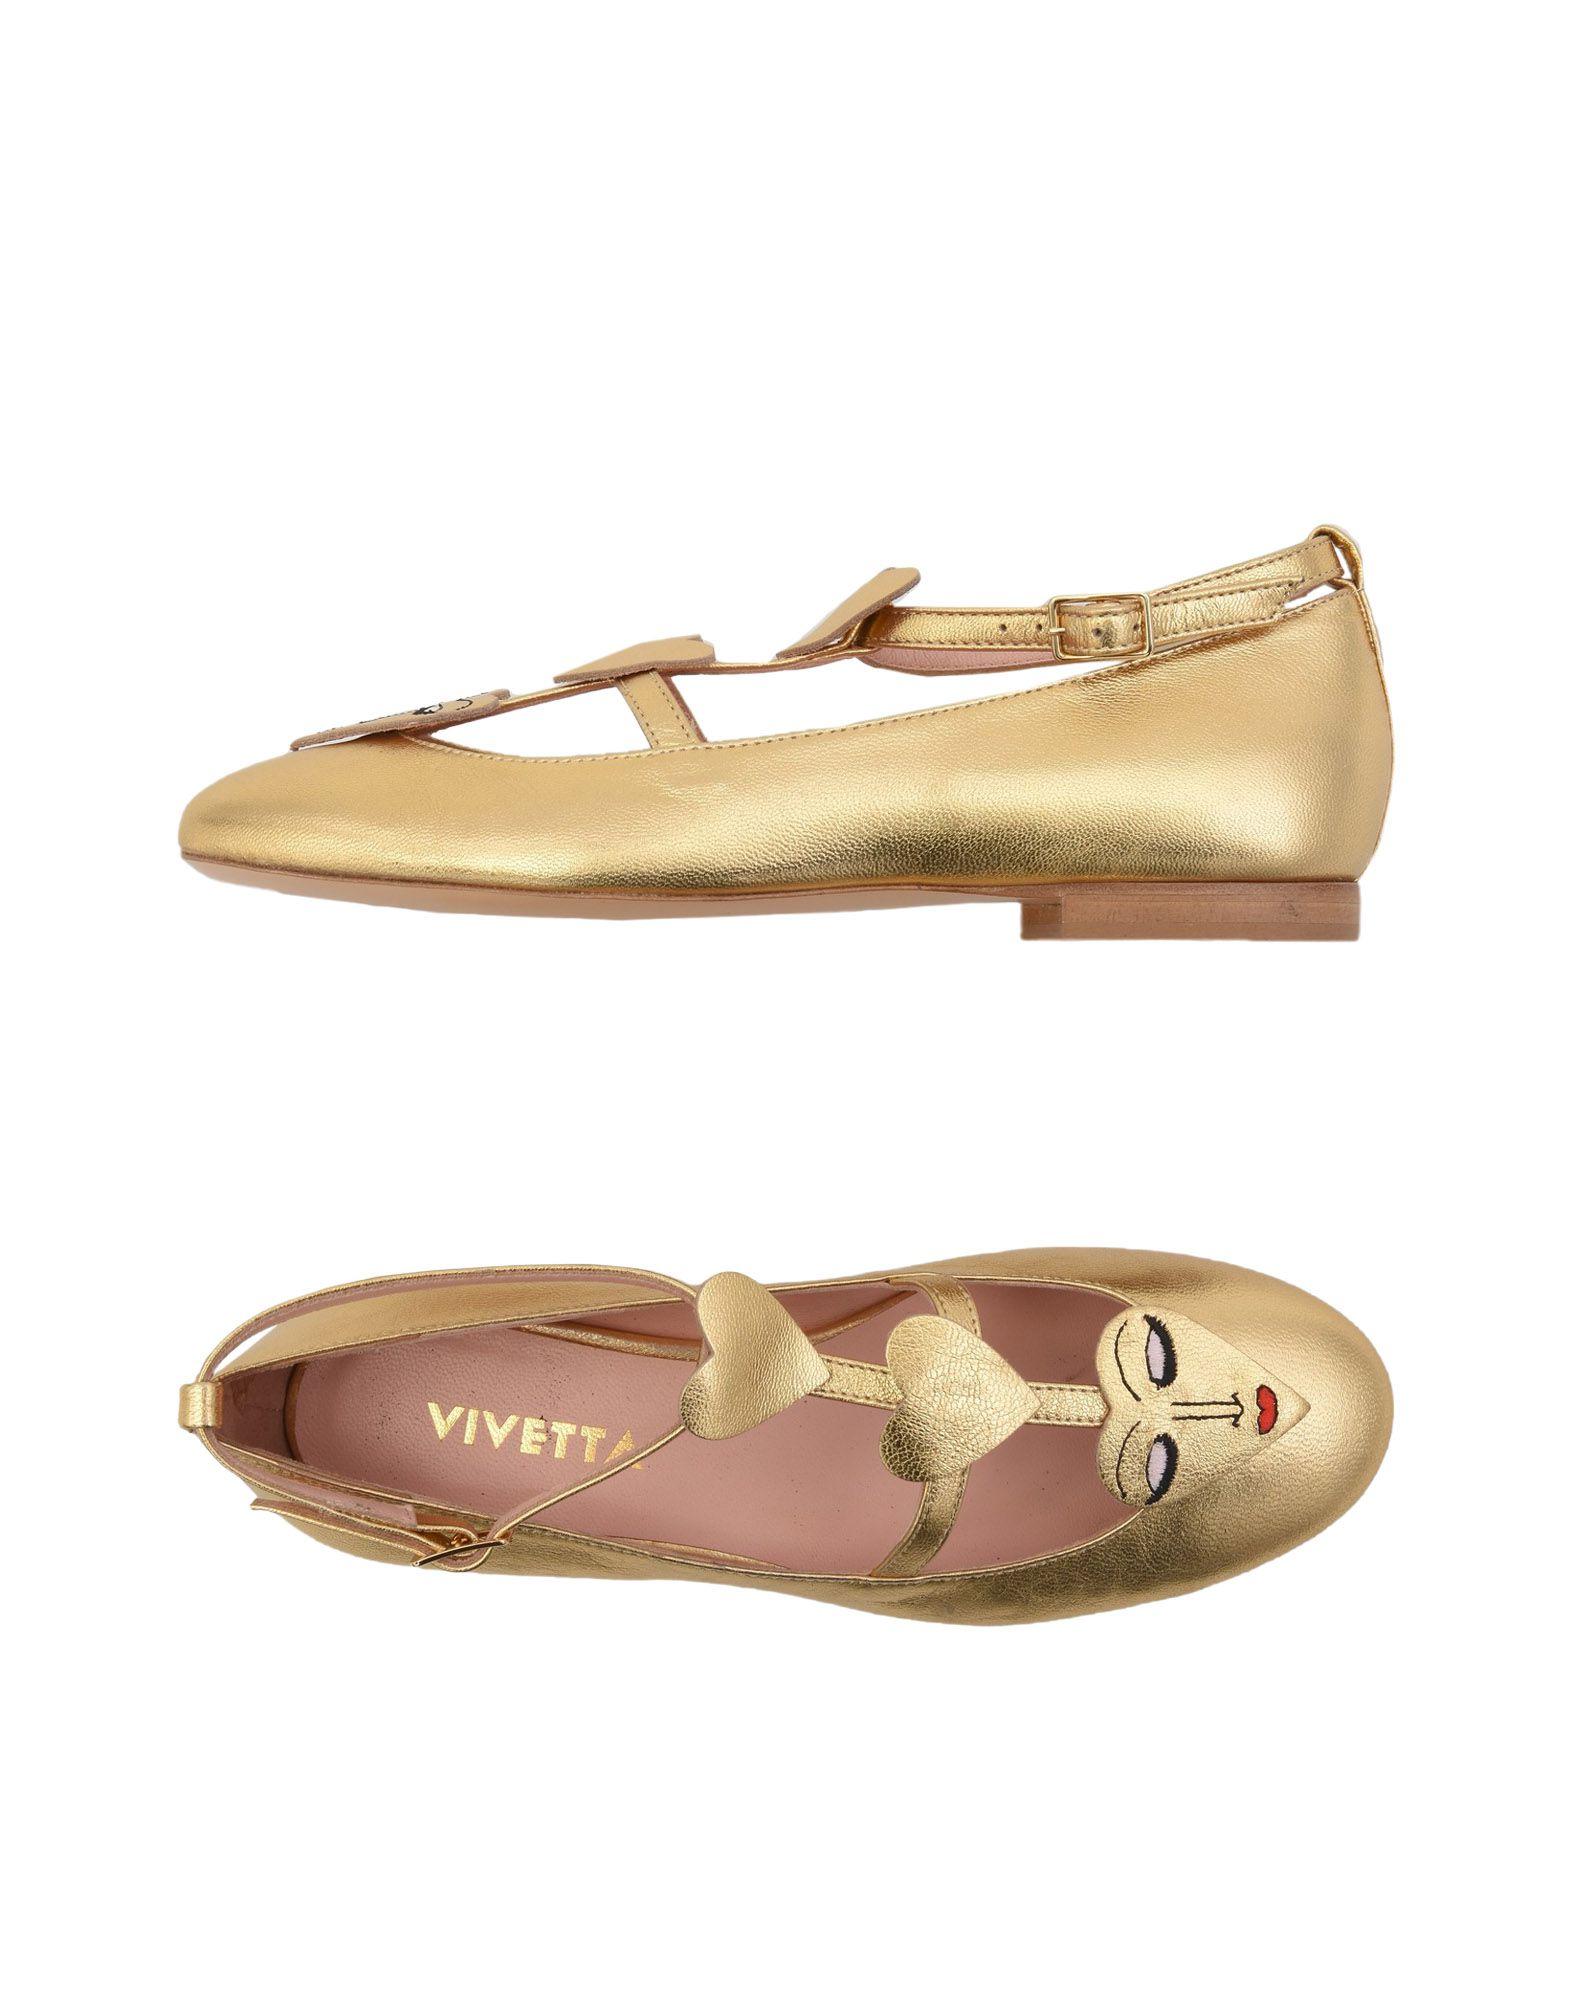 Vivetta Ballerinas Damen Schuhe  11421867OX Heiße Schuhe Damen e6c6c2